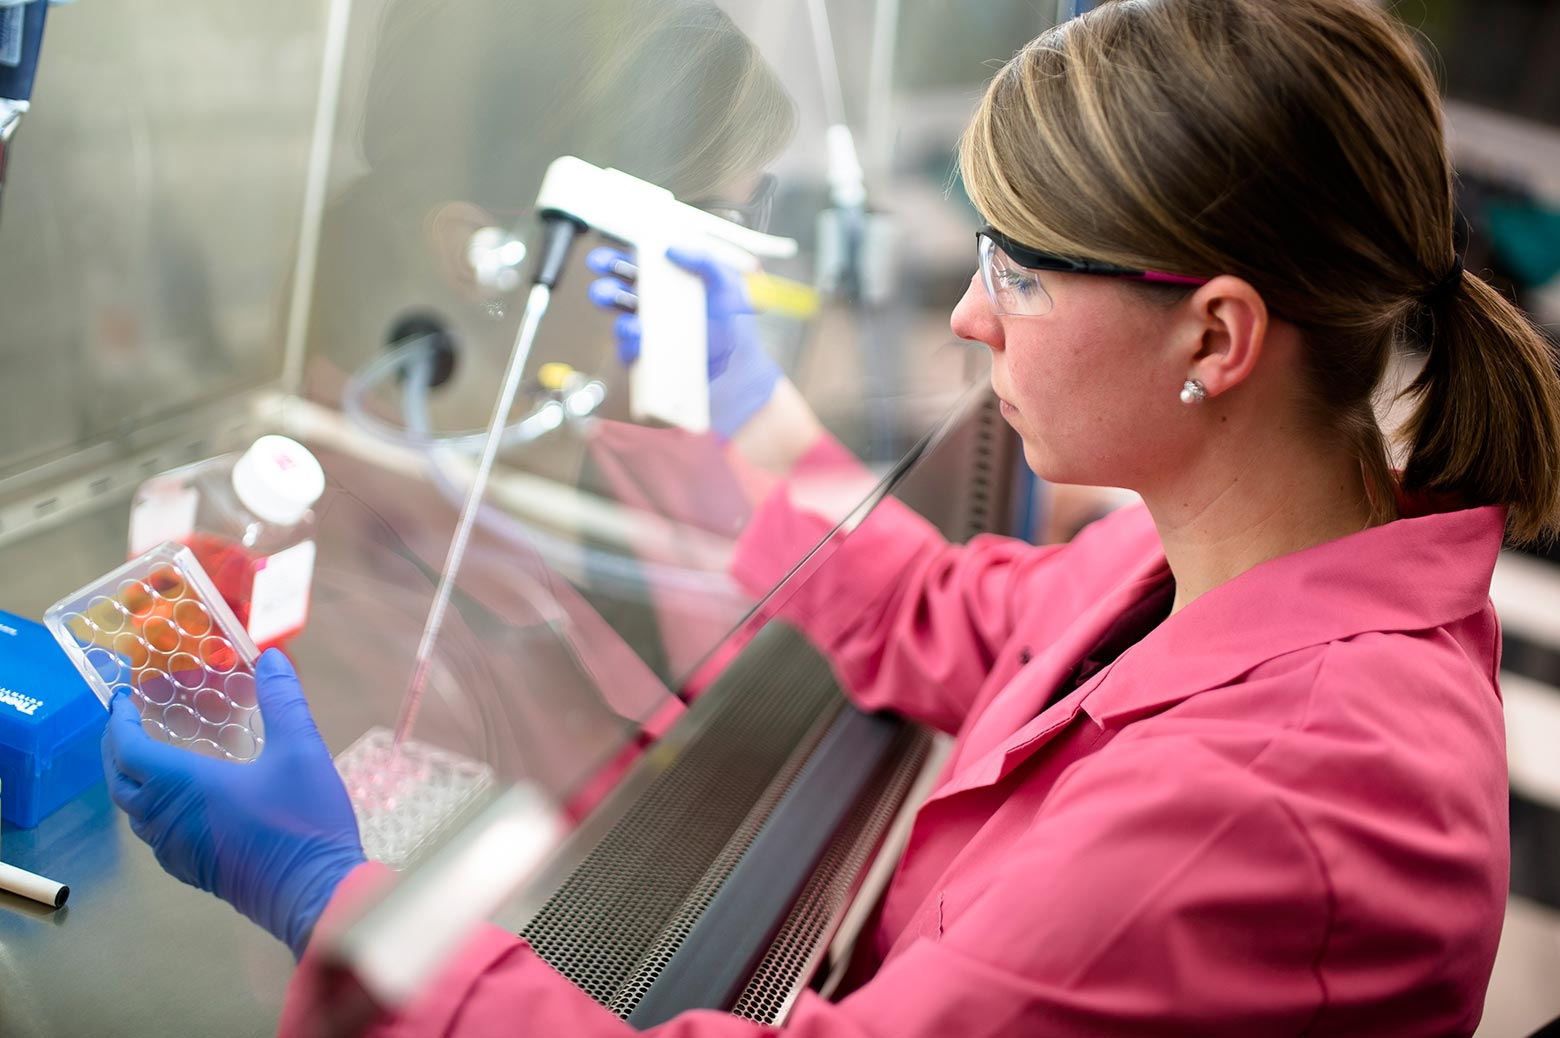 Brandon Baier – Biomedical Engineering at the University of Michigan